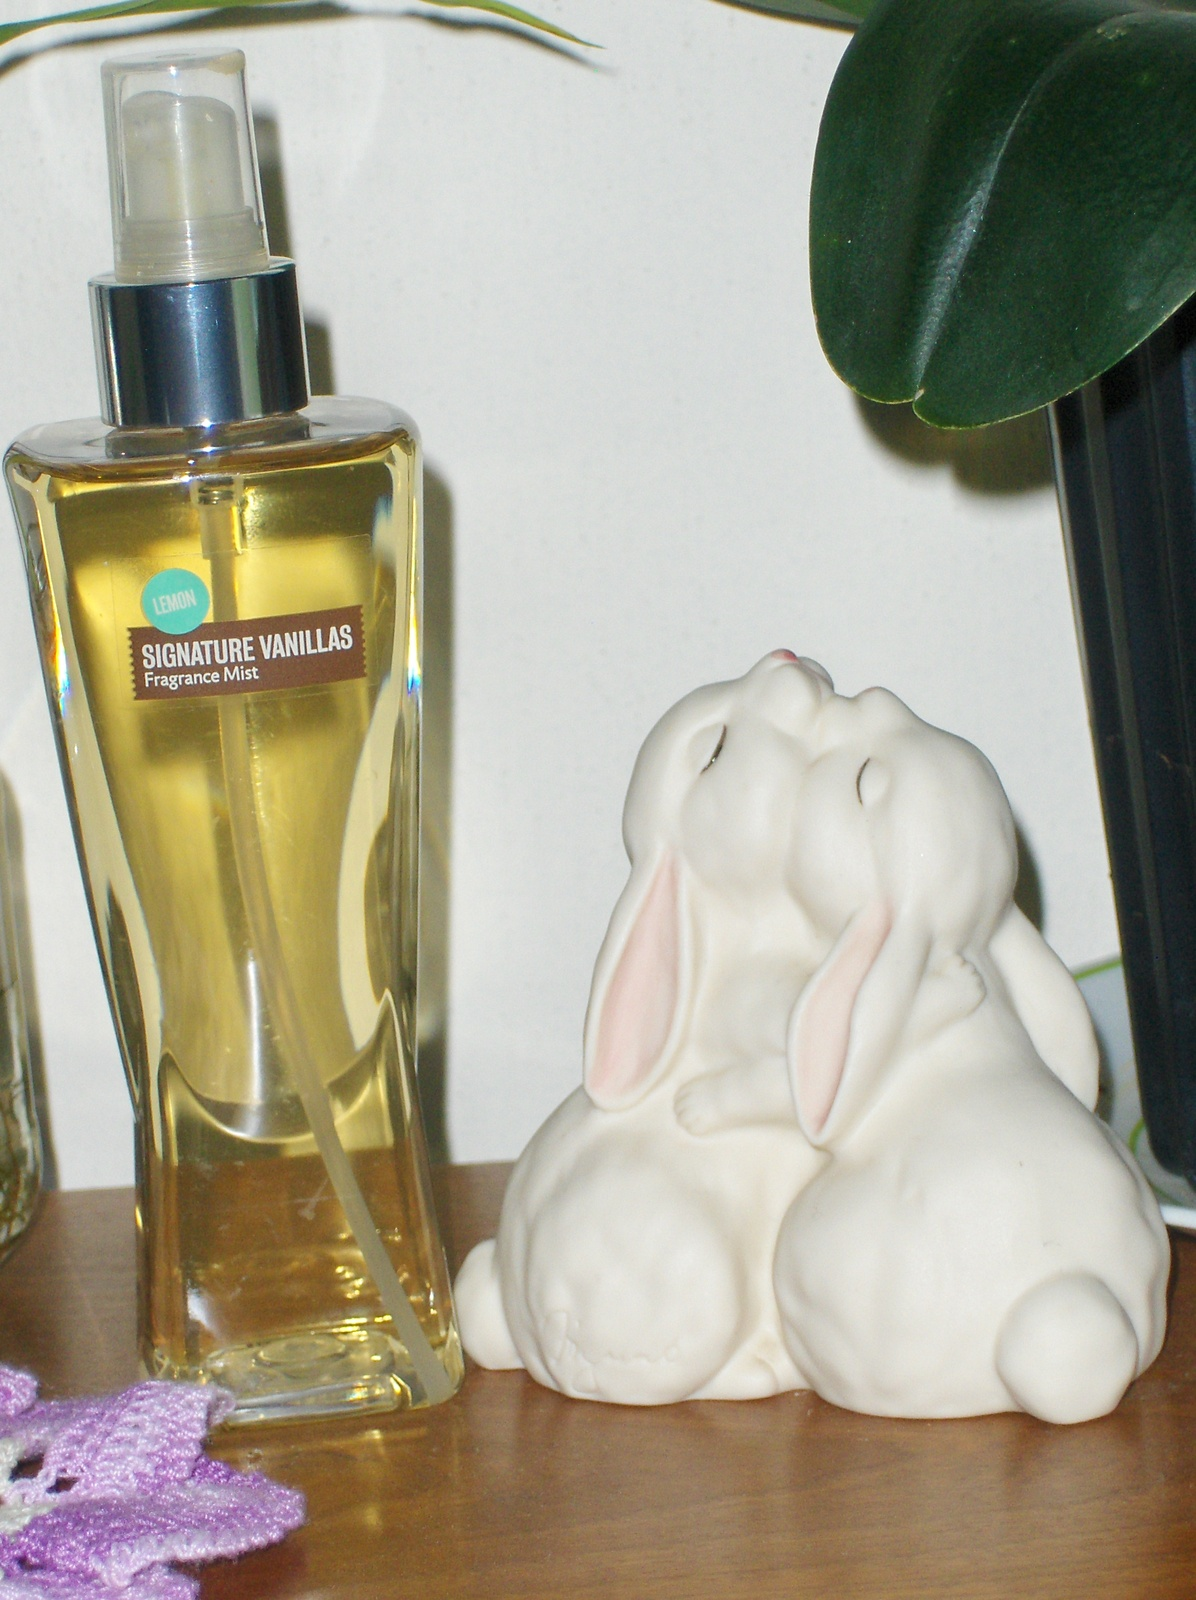 Bath & Body Works Lemon Signature Vanillas Fragrance Mist 8 oz Signature Splash